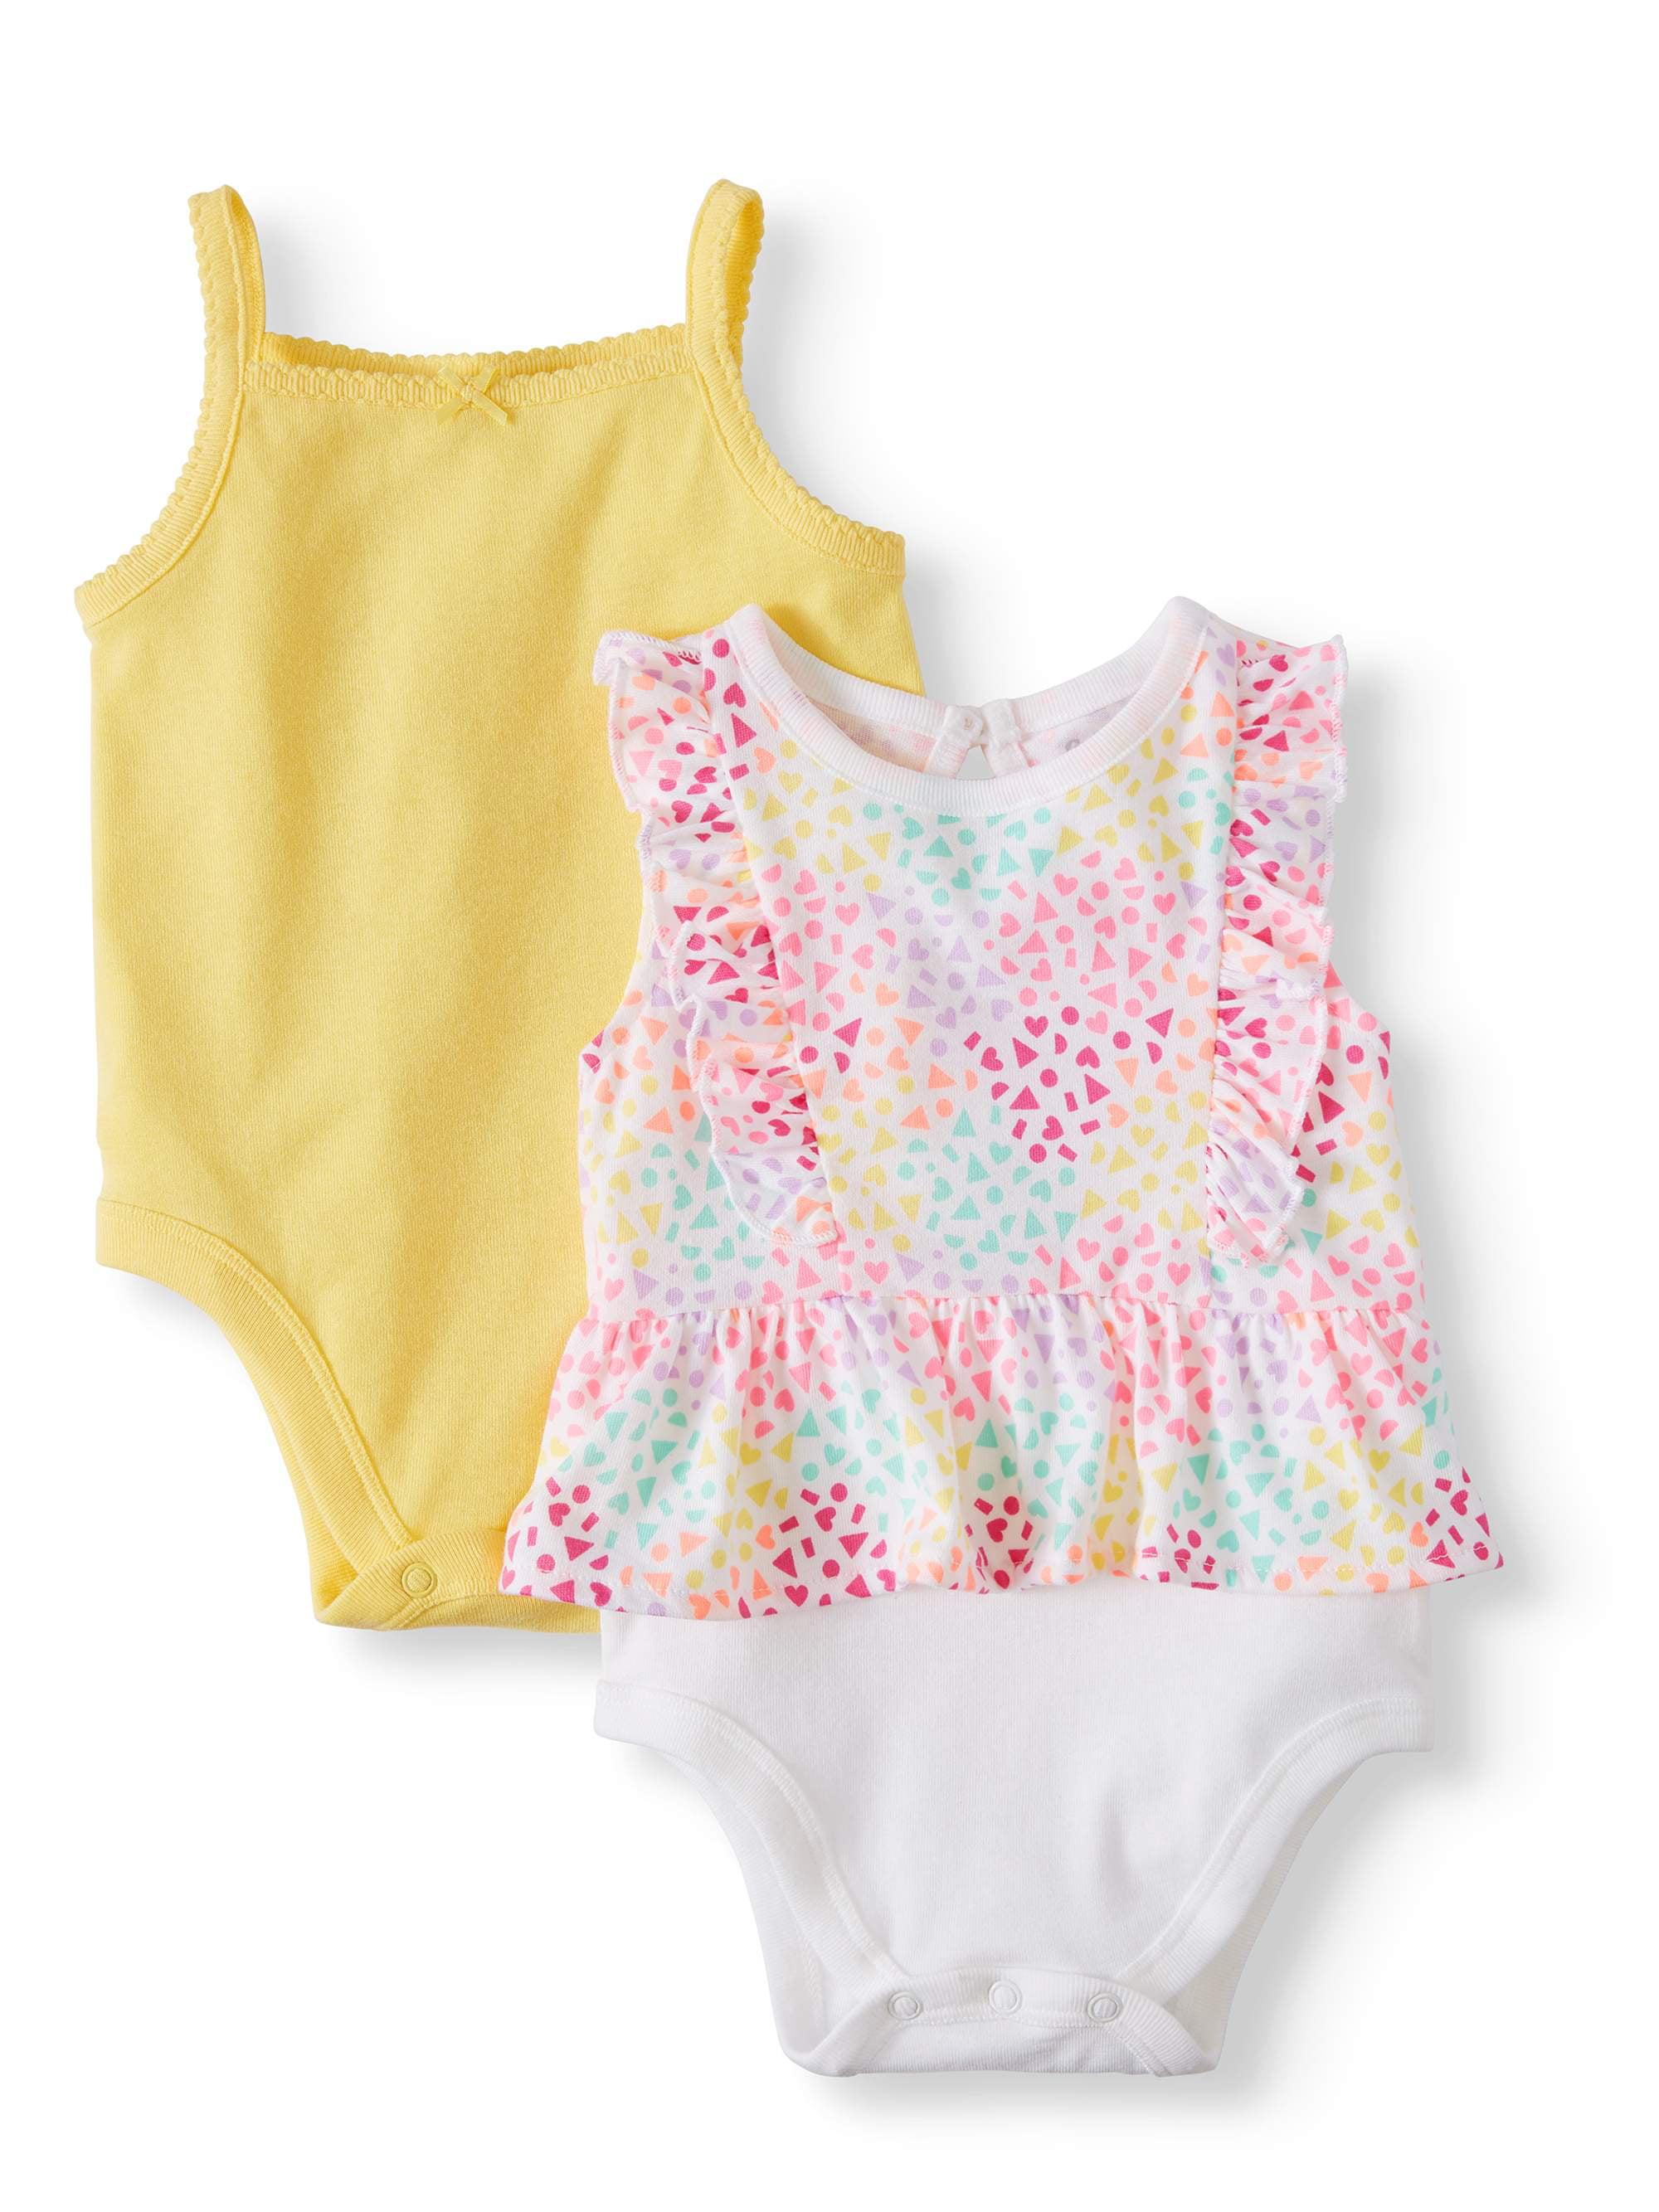 Baby Girls' Solid Cami and Ruffle Peplum Bodysuits, 2-Piece Multi-Pack